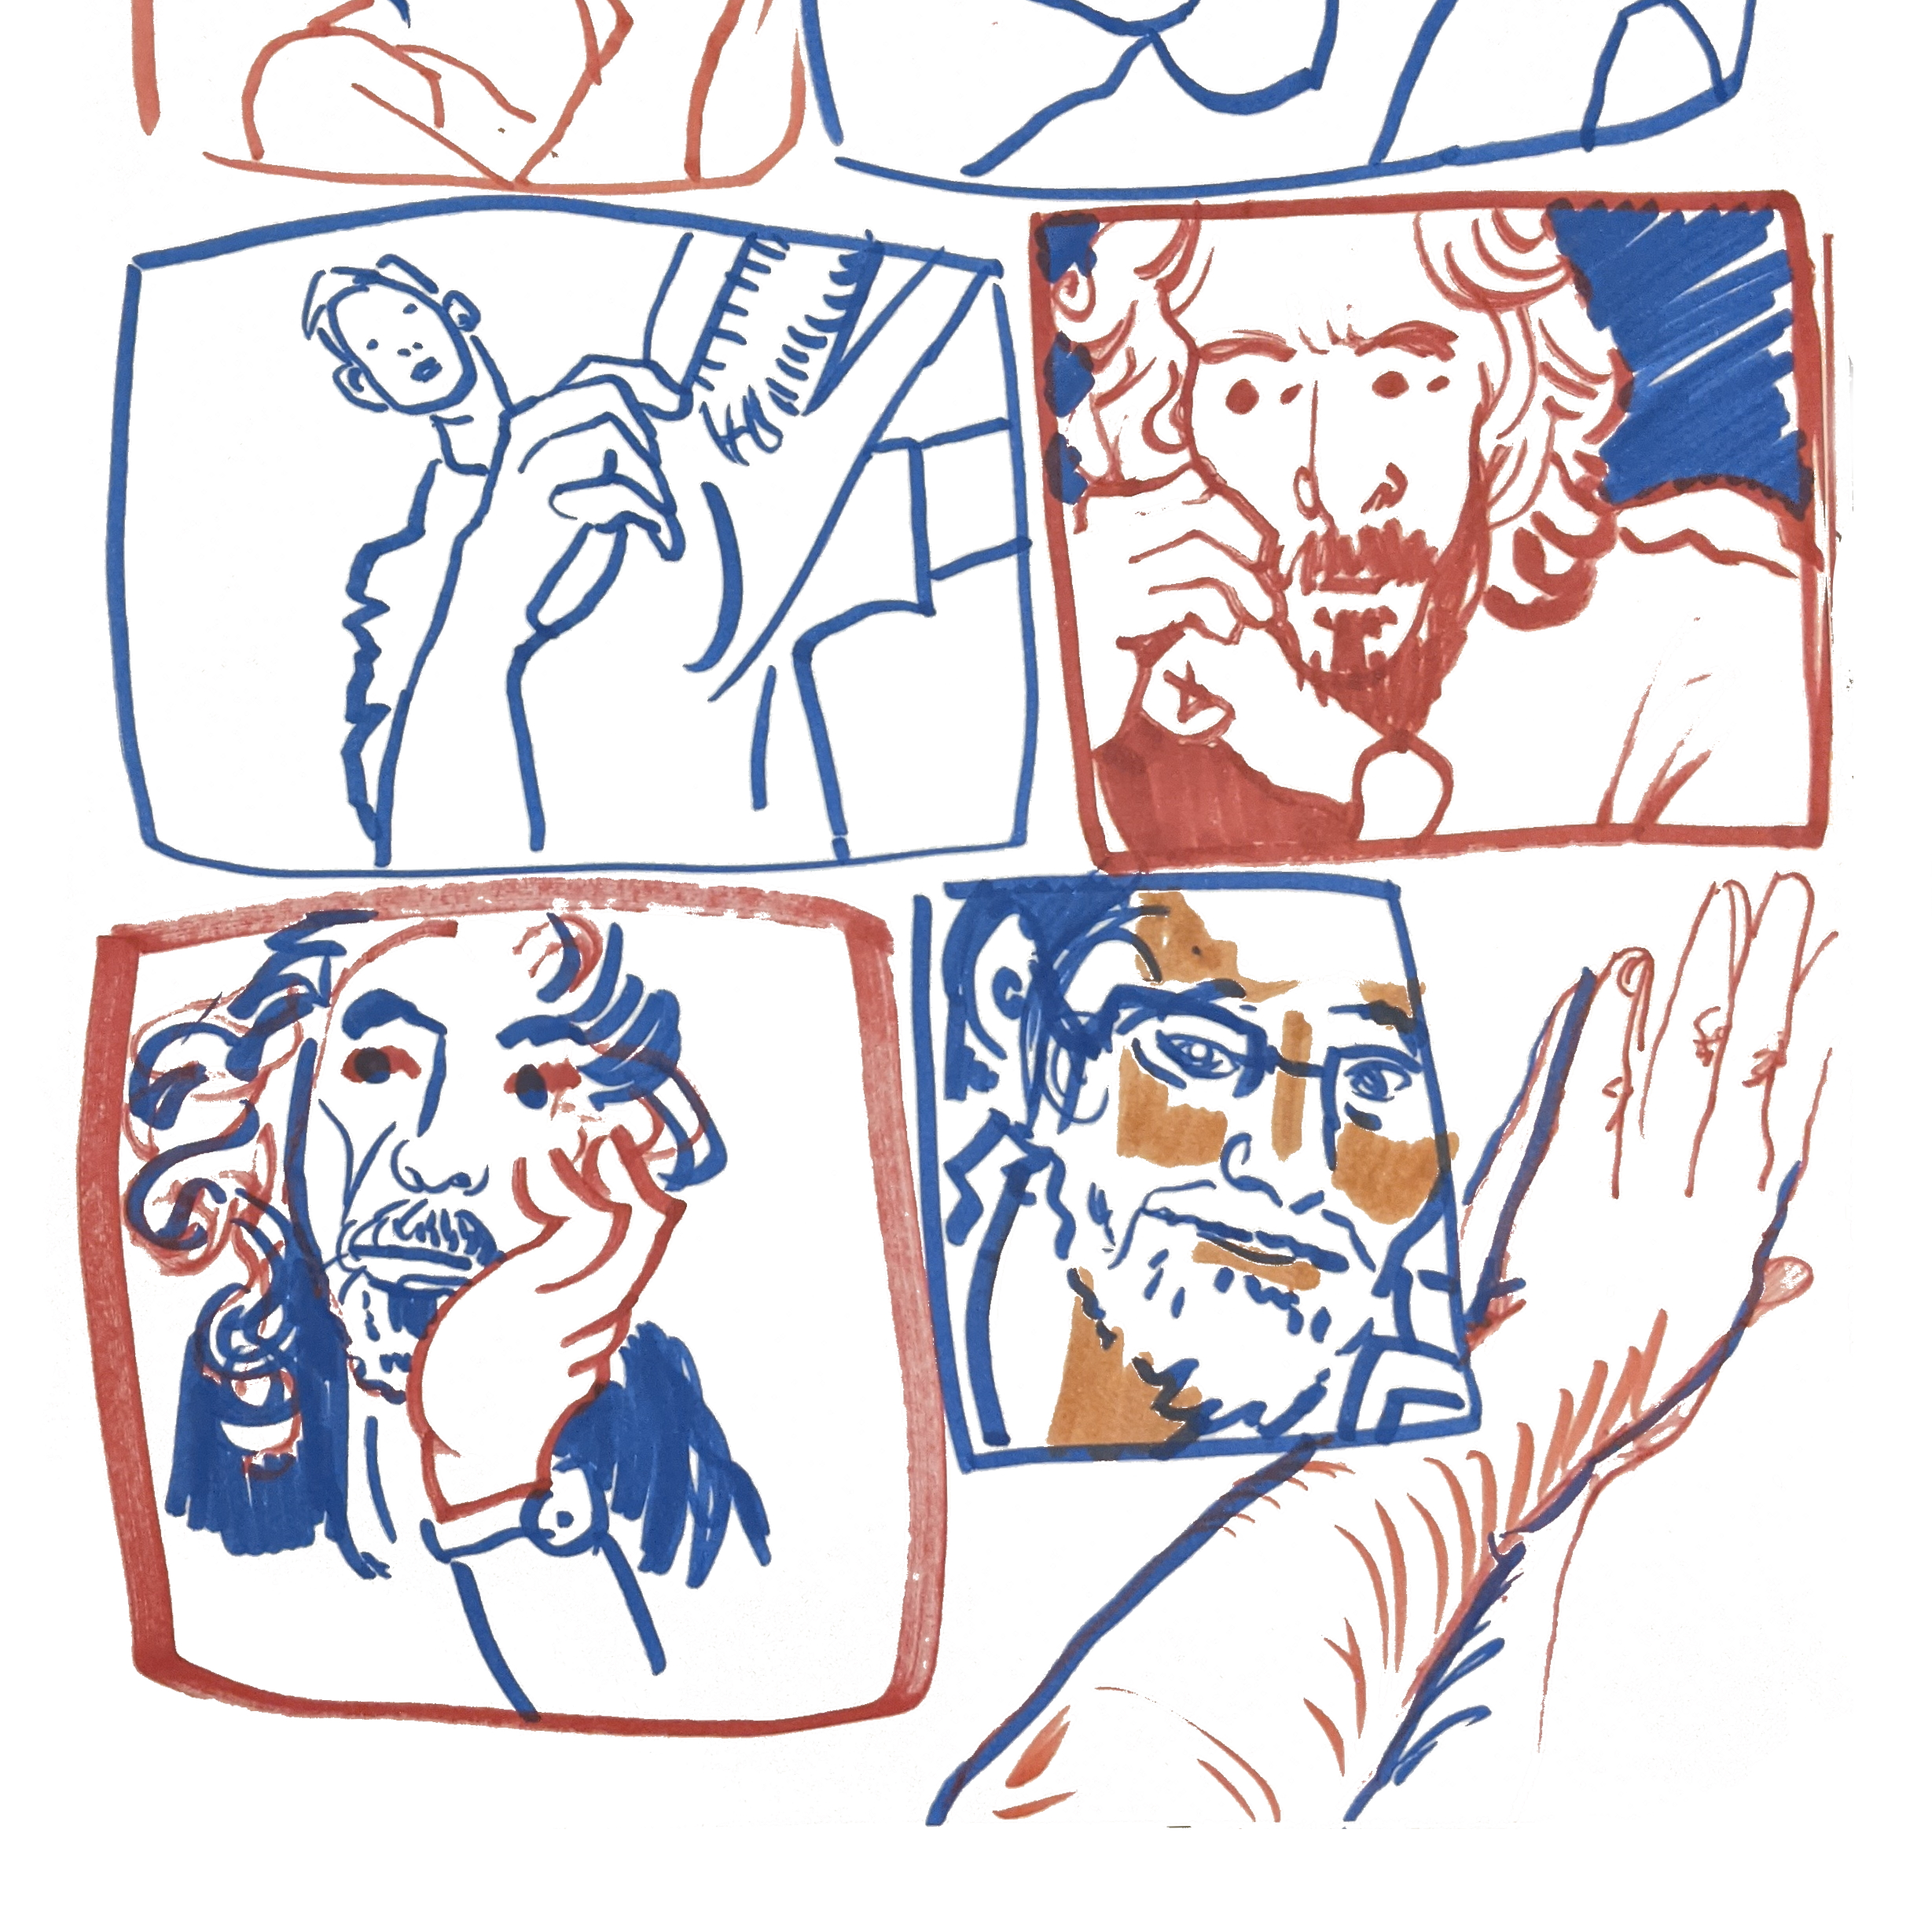 Two Minute Portraits - Bottom 4